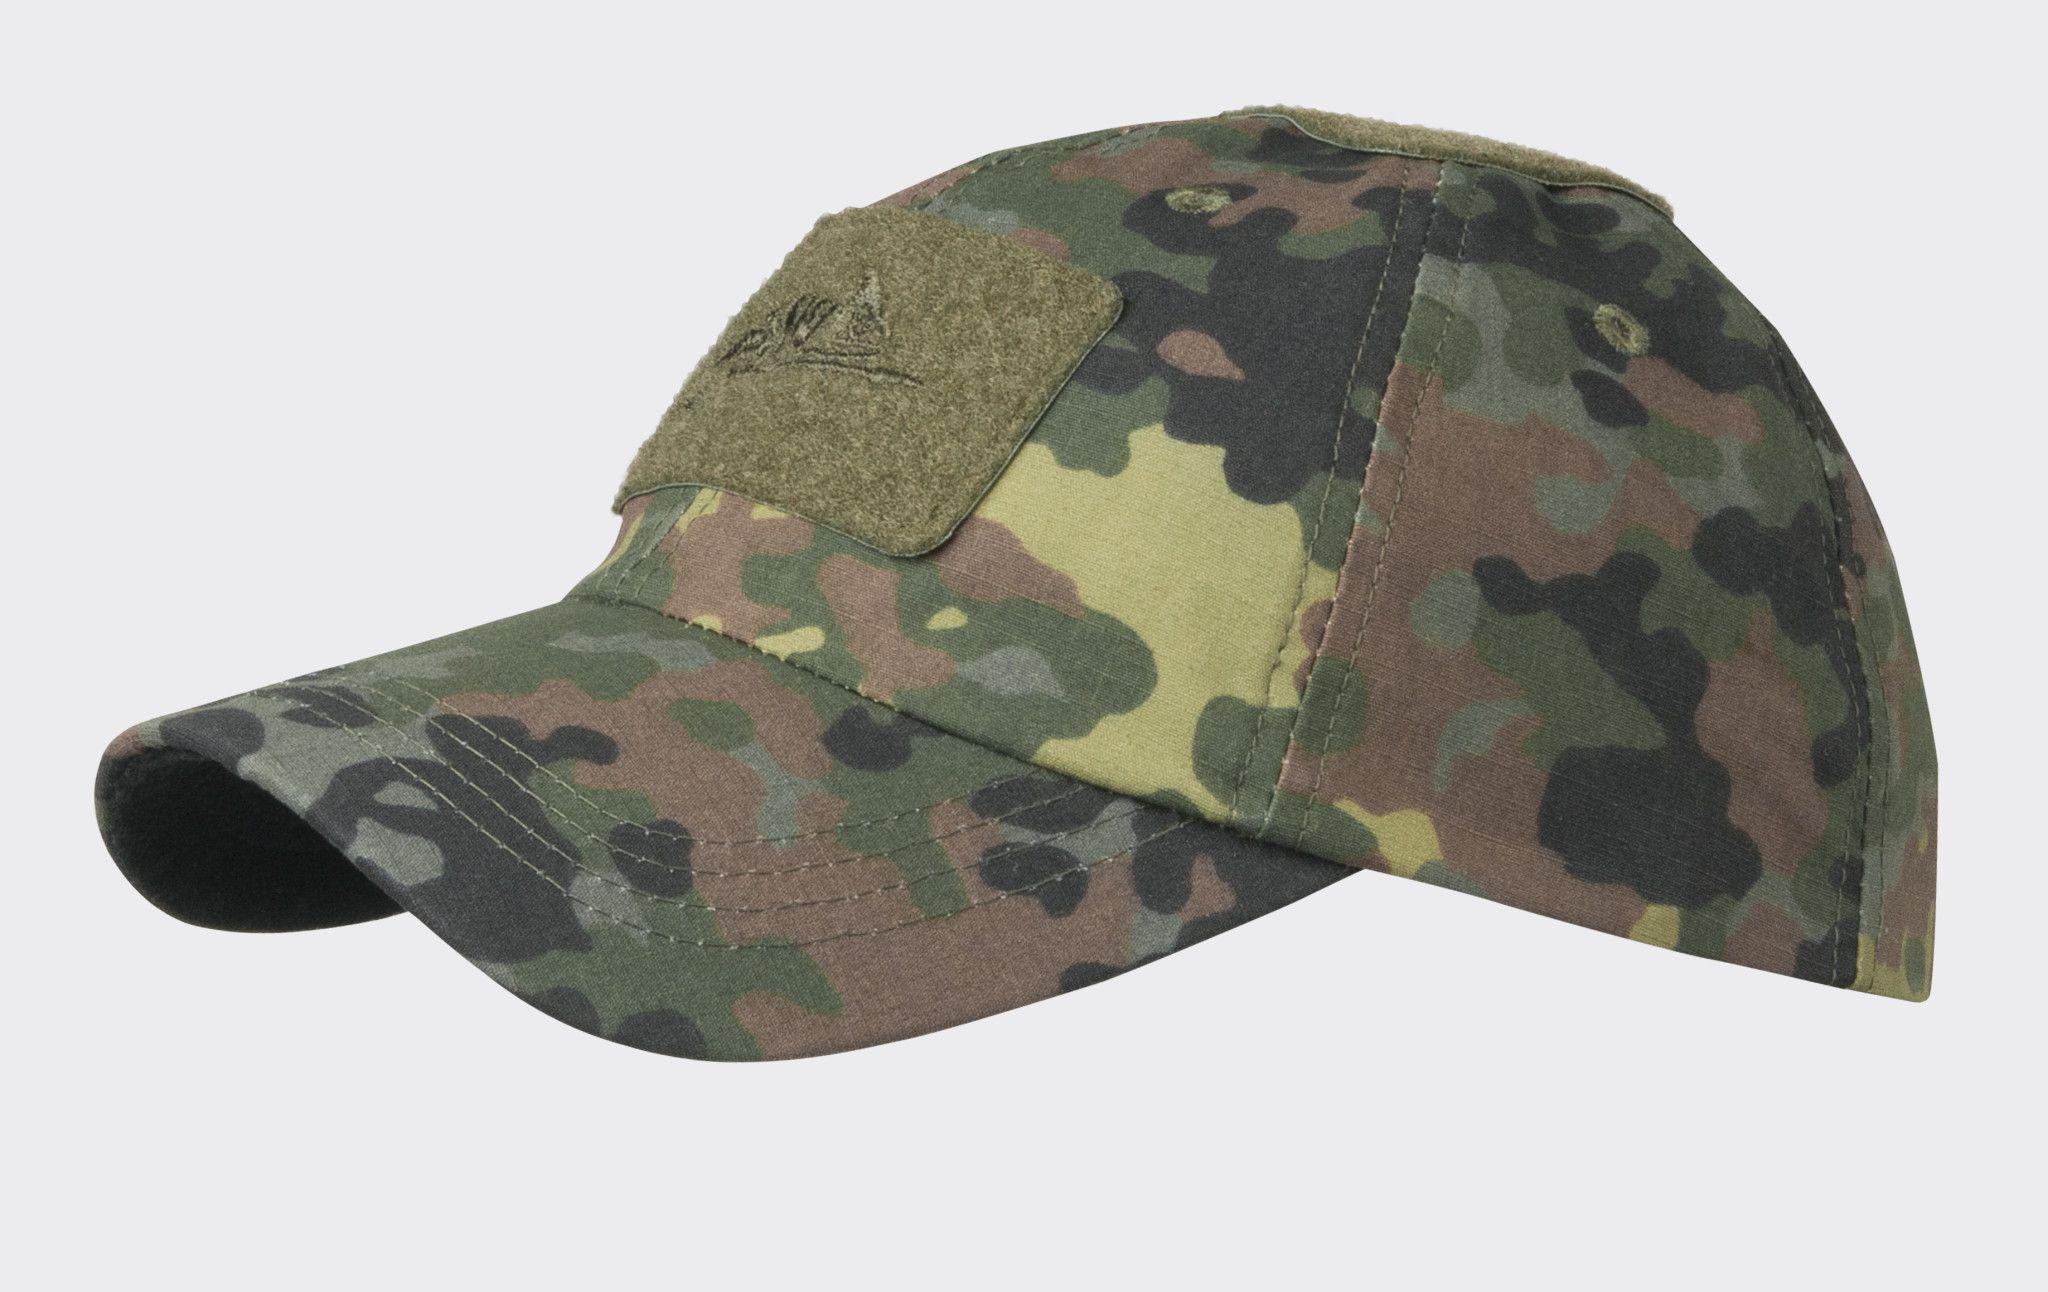 fec04552c Helikon Tactical Baseball cap Flecktarn Camo | Tactical Clothing ...